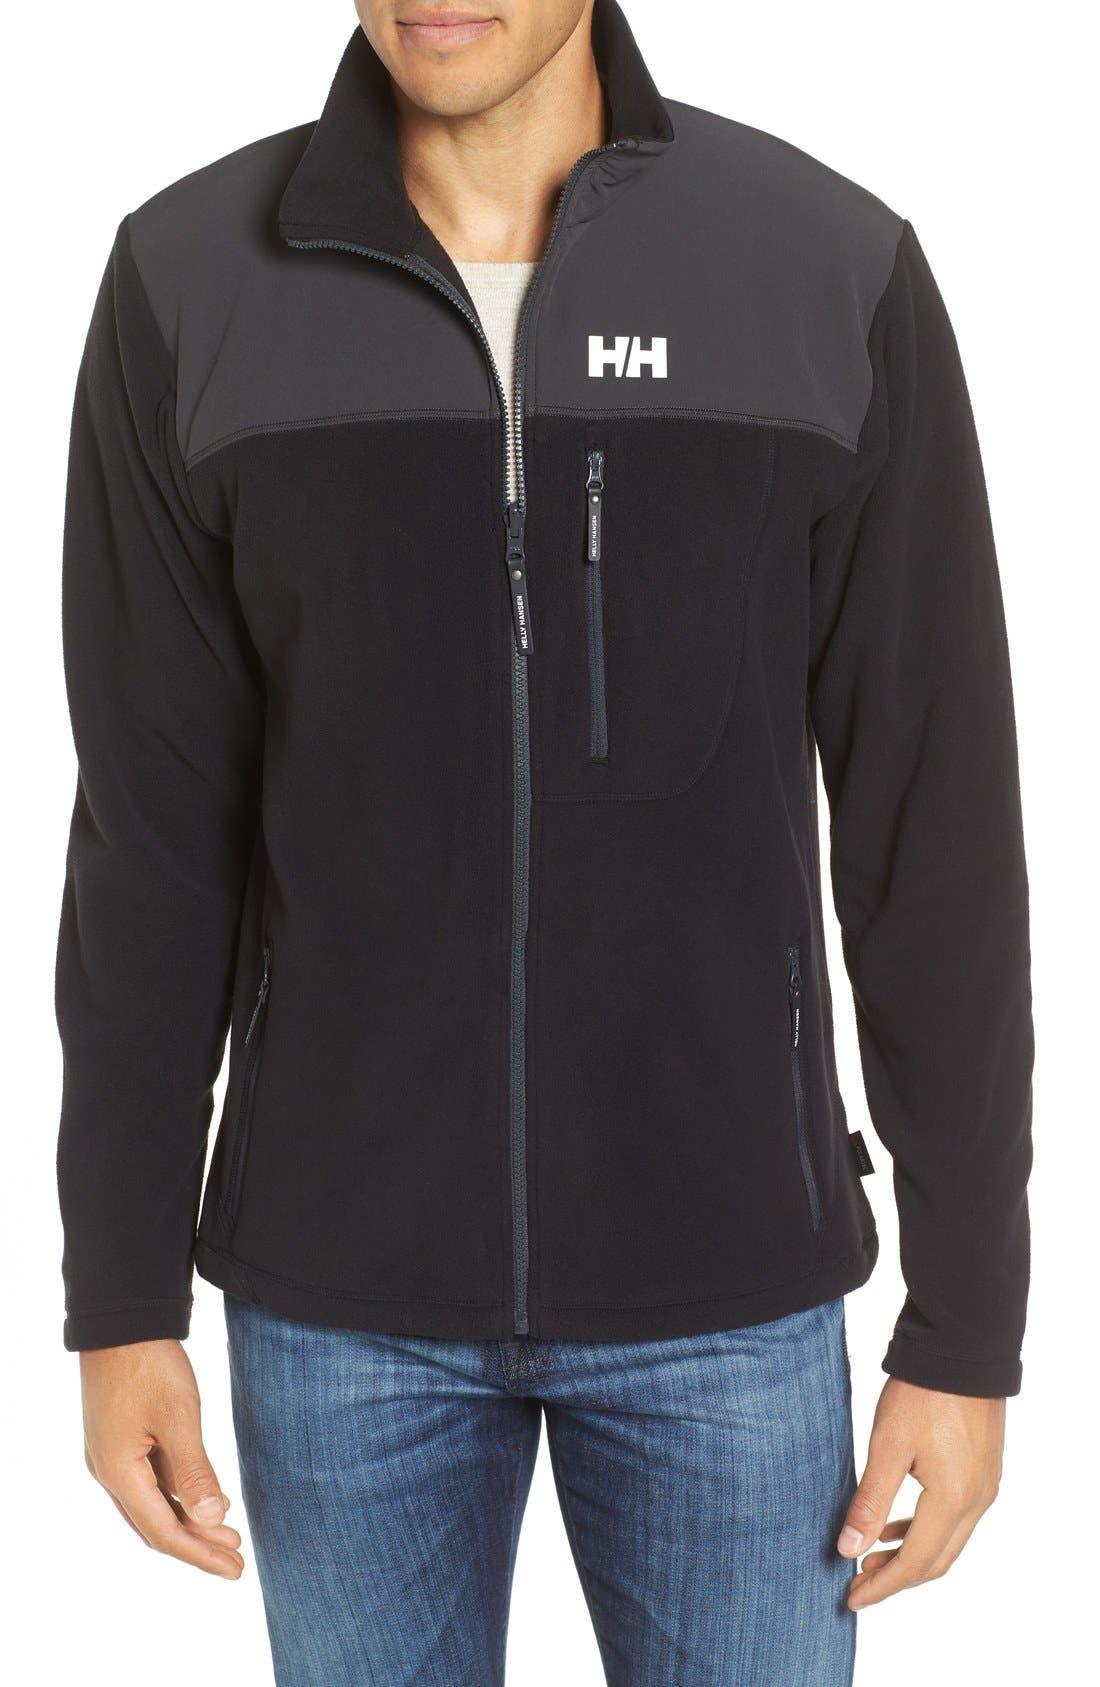 Sitka Fleece Jacket,                         Main,                         color, 001